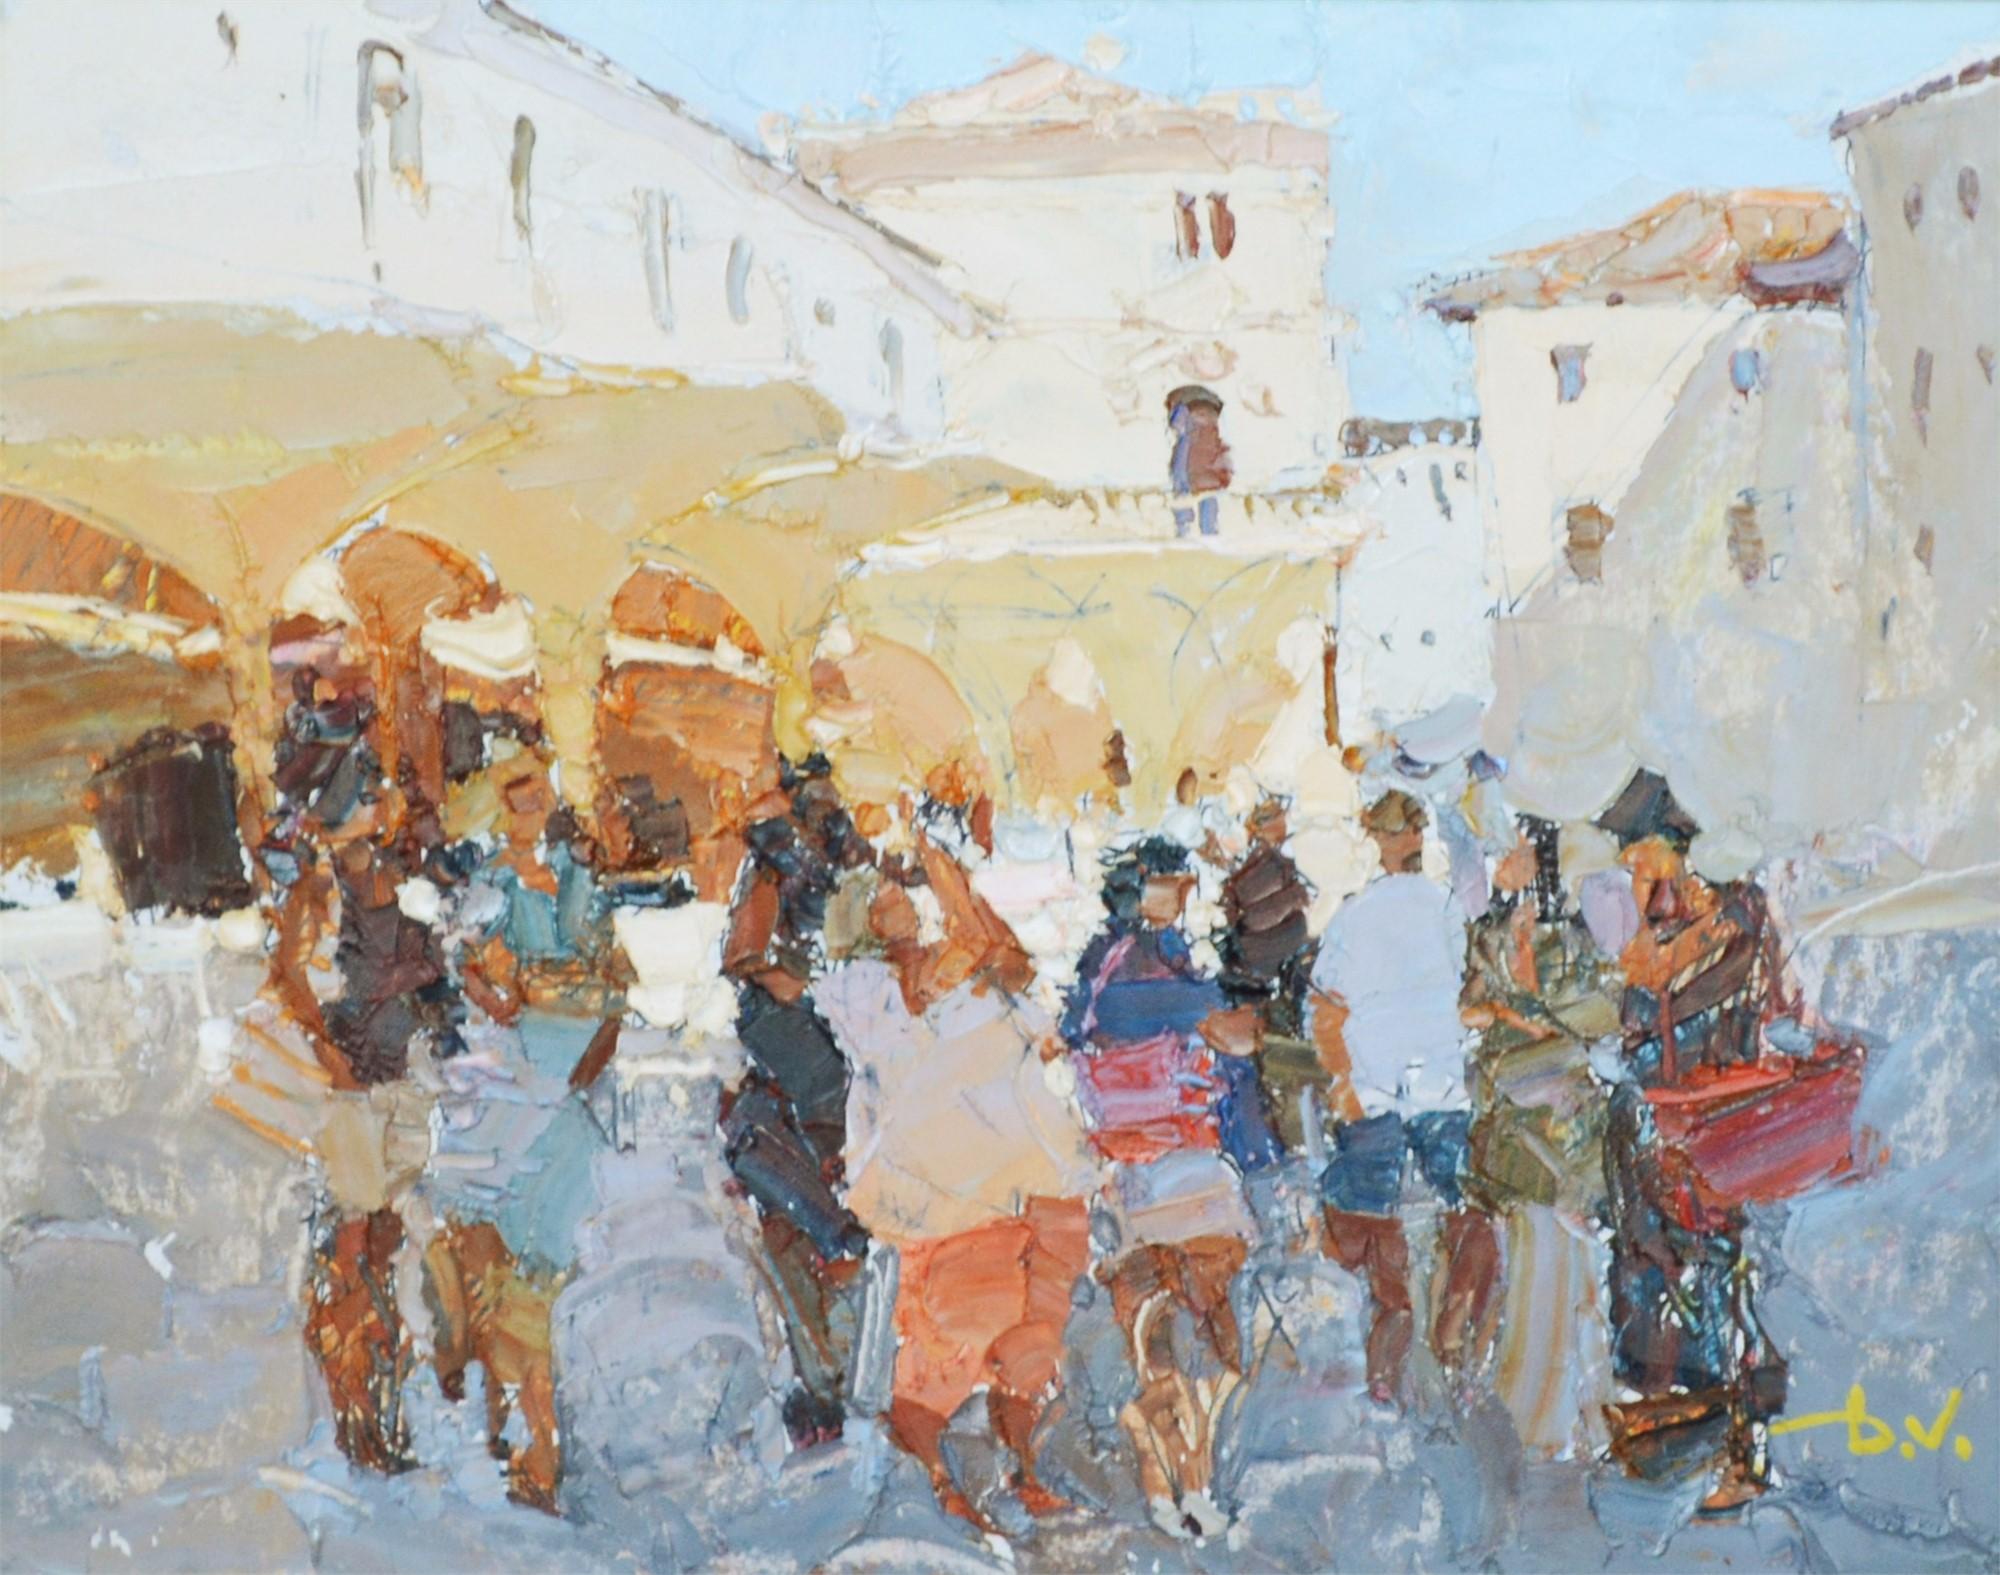 Dubrovnik Street by Daniil Volkov